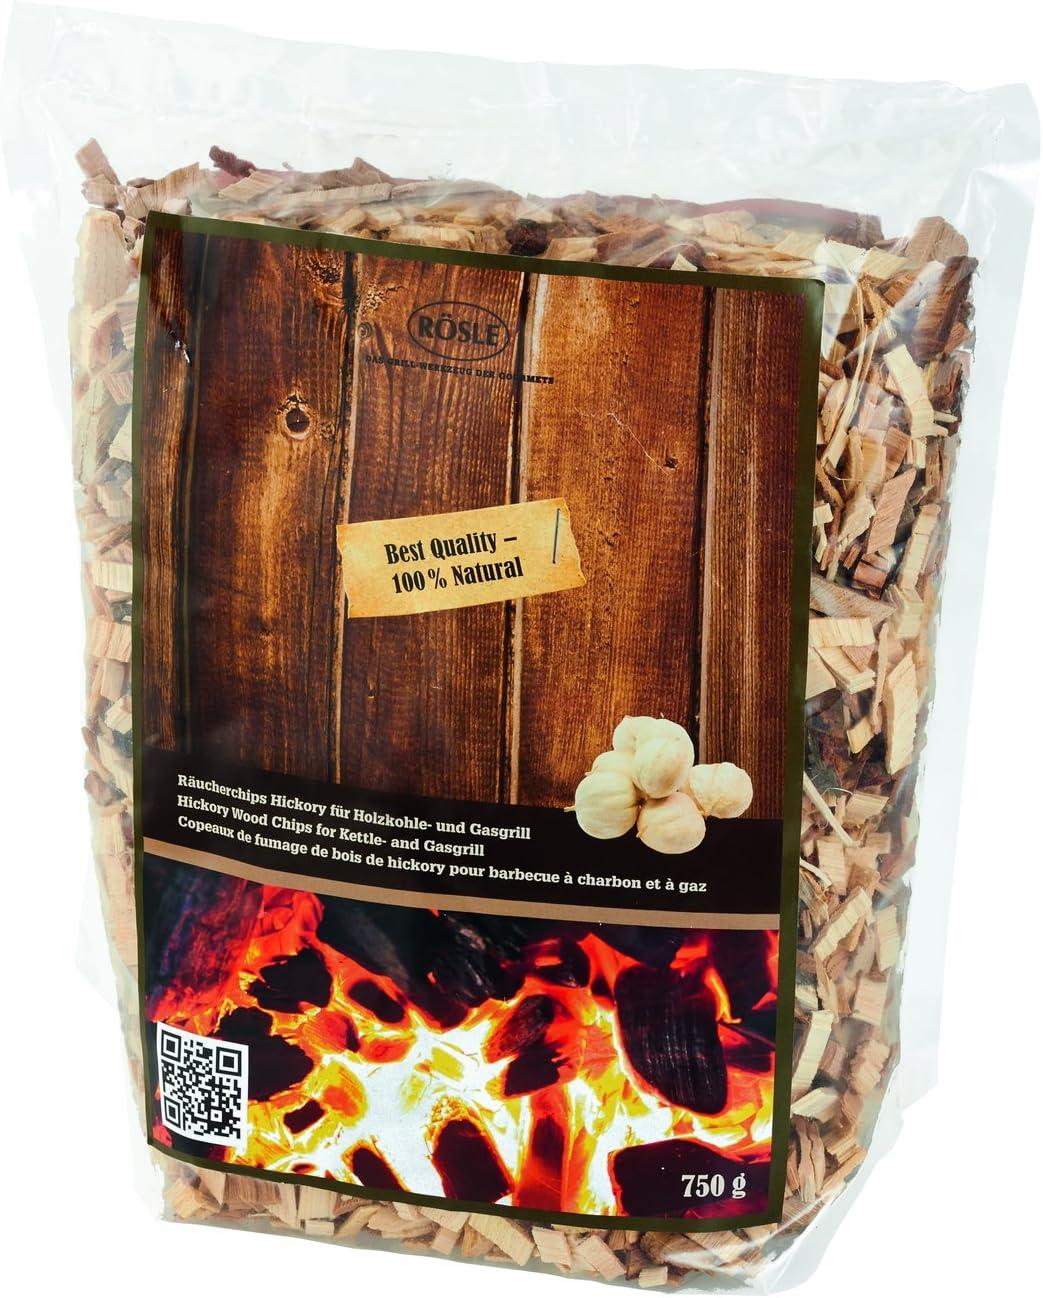 NEUF Rösle Barbecue Accessoires Räucherchips Cerise 25105